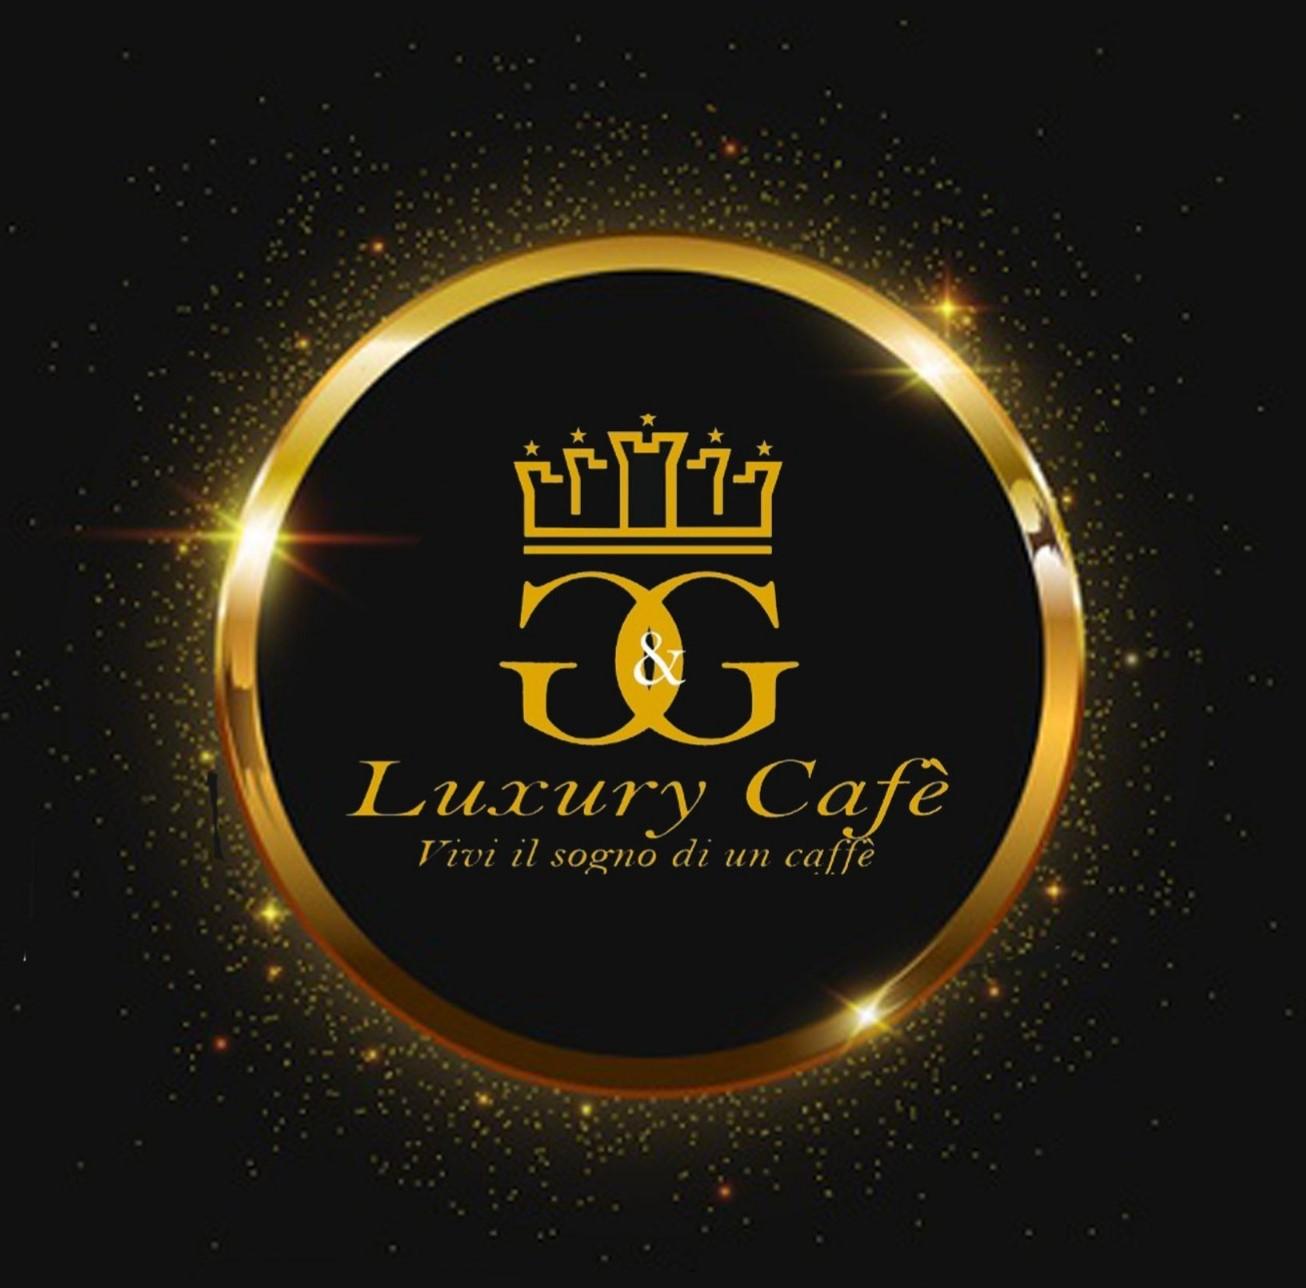 G&G Luxury Cafè